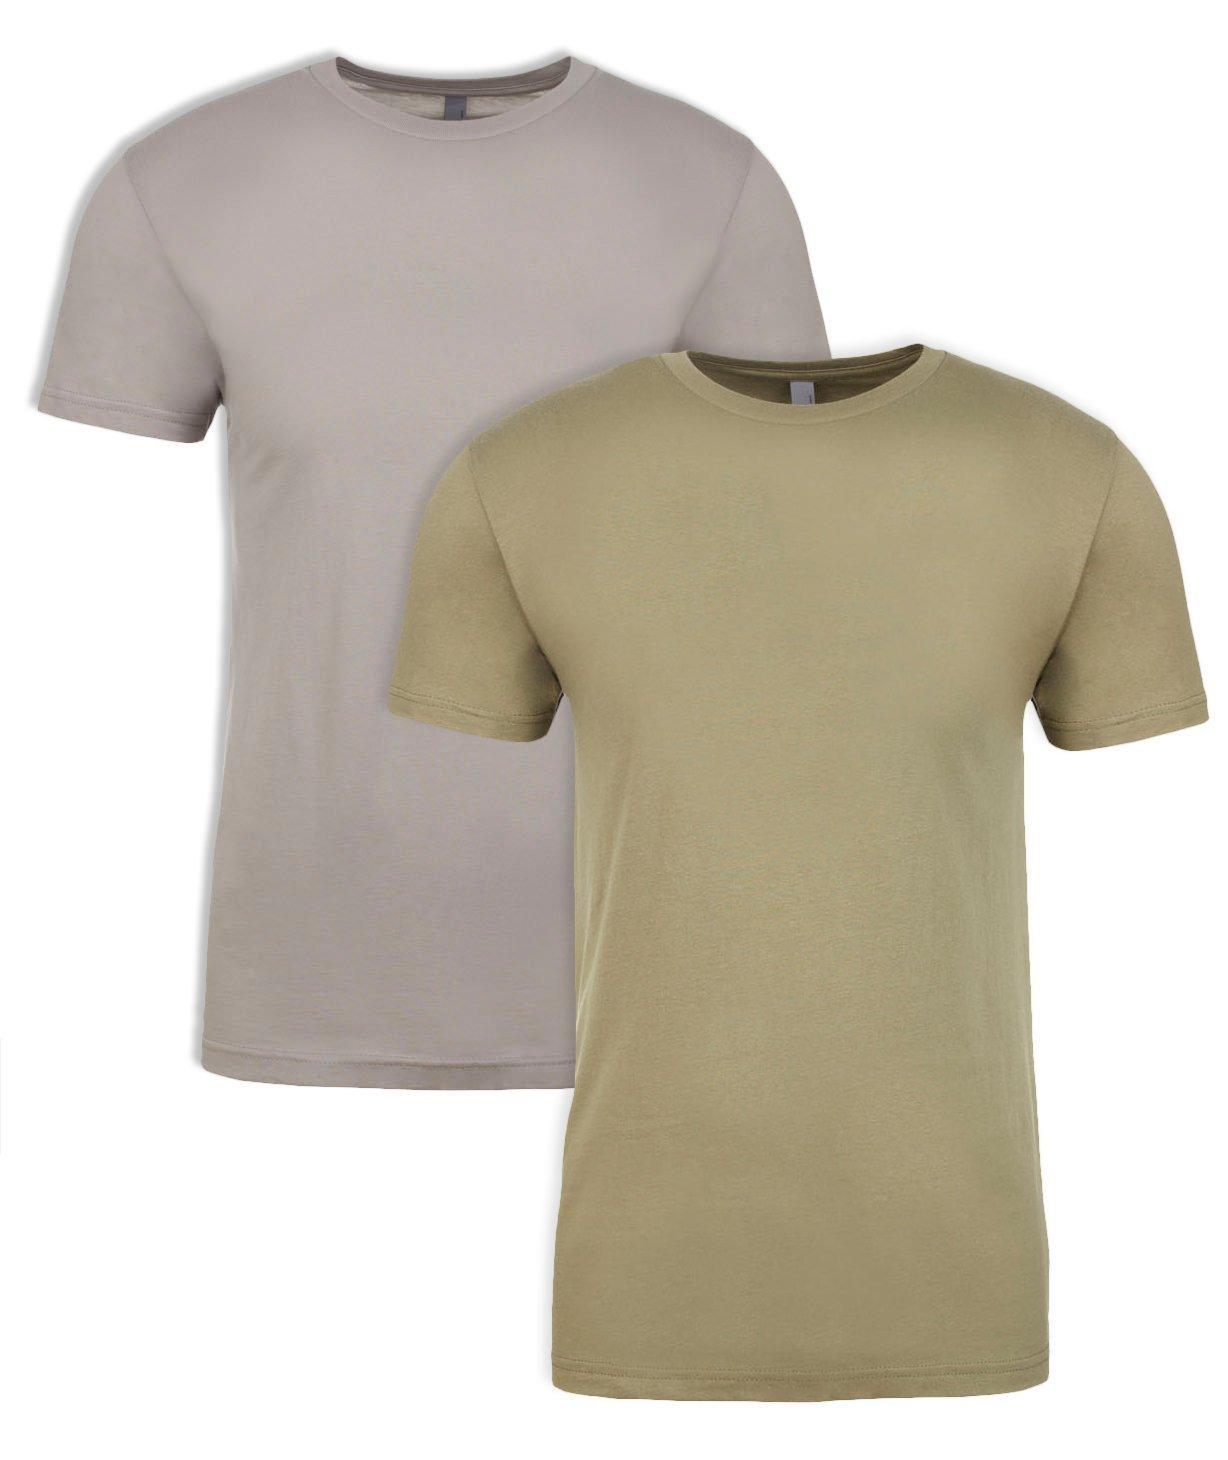 - Next Level NL3600 100% Cotton Premium Fitted Short Sleeve Crew 1 Light Grey + 1 Light Olive XX-Large